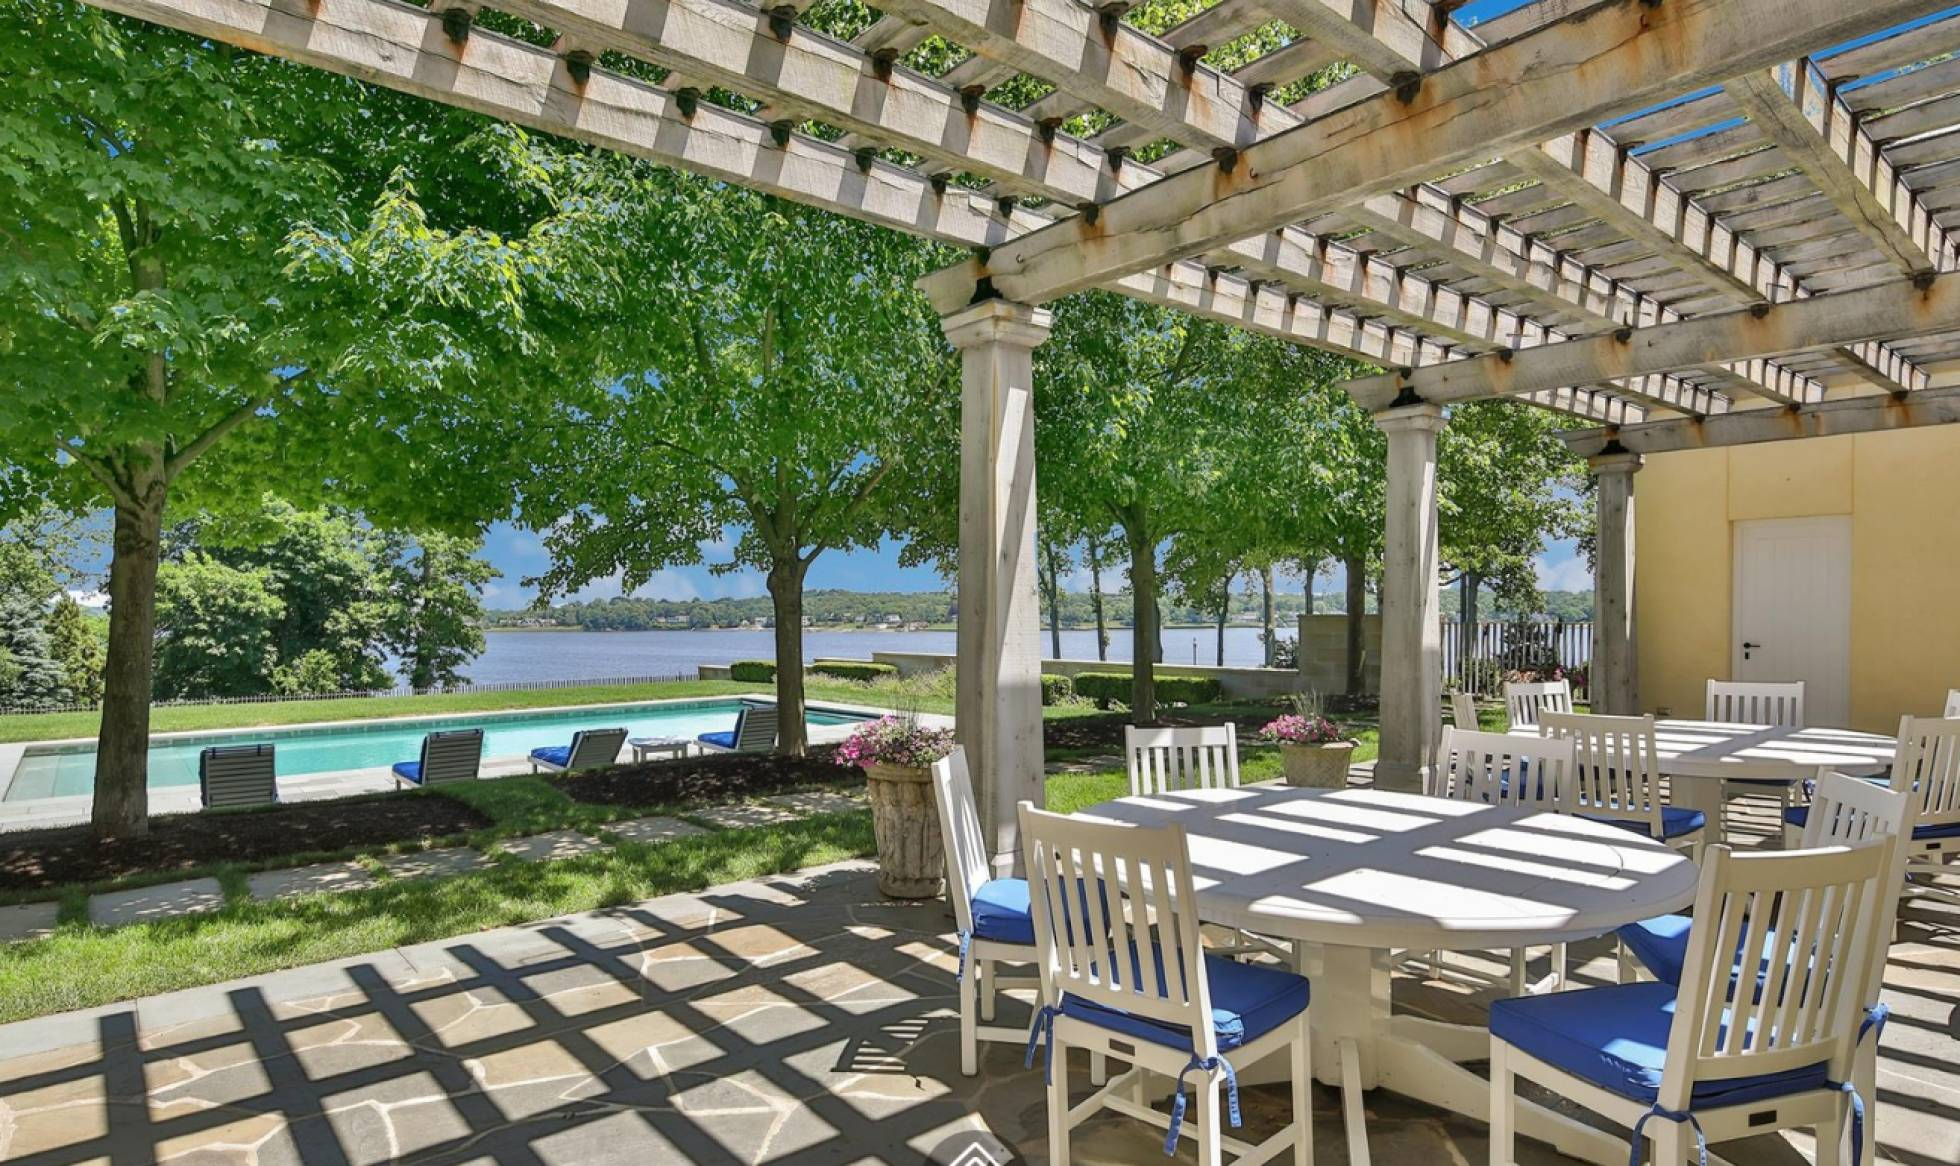 A área da piscina da propriedade de Jon Bon Jovi.